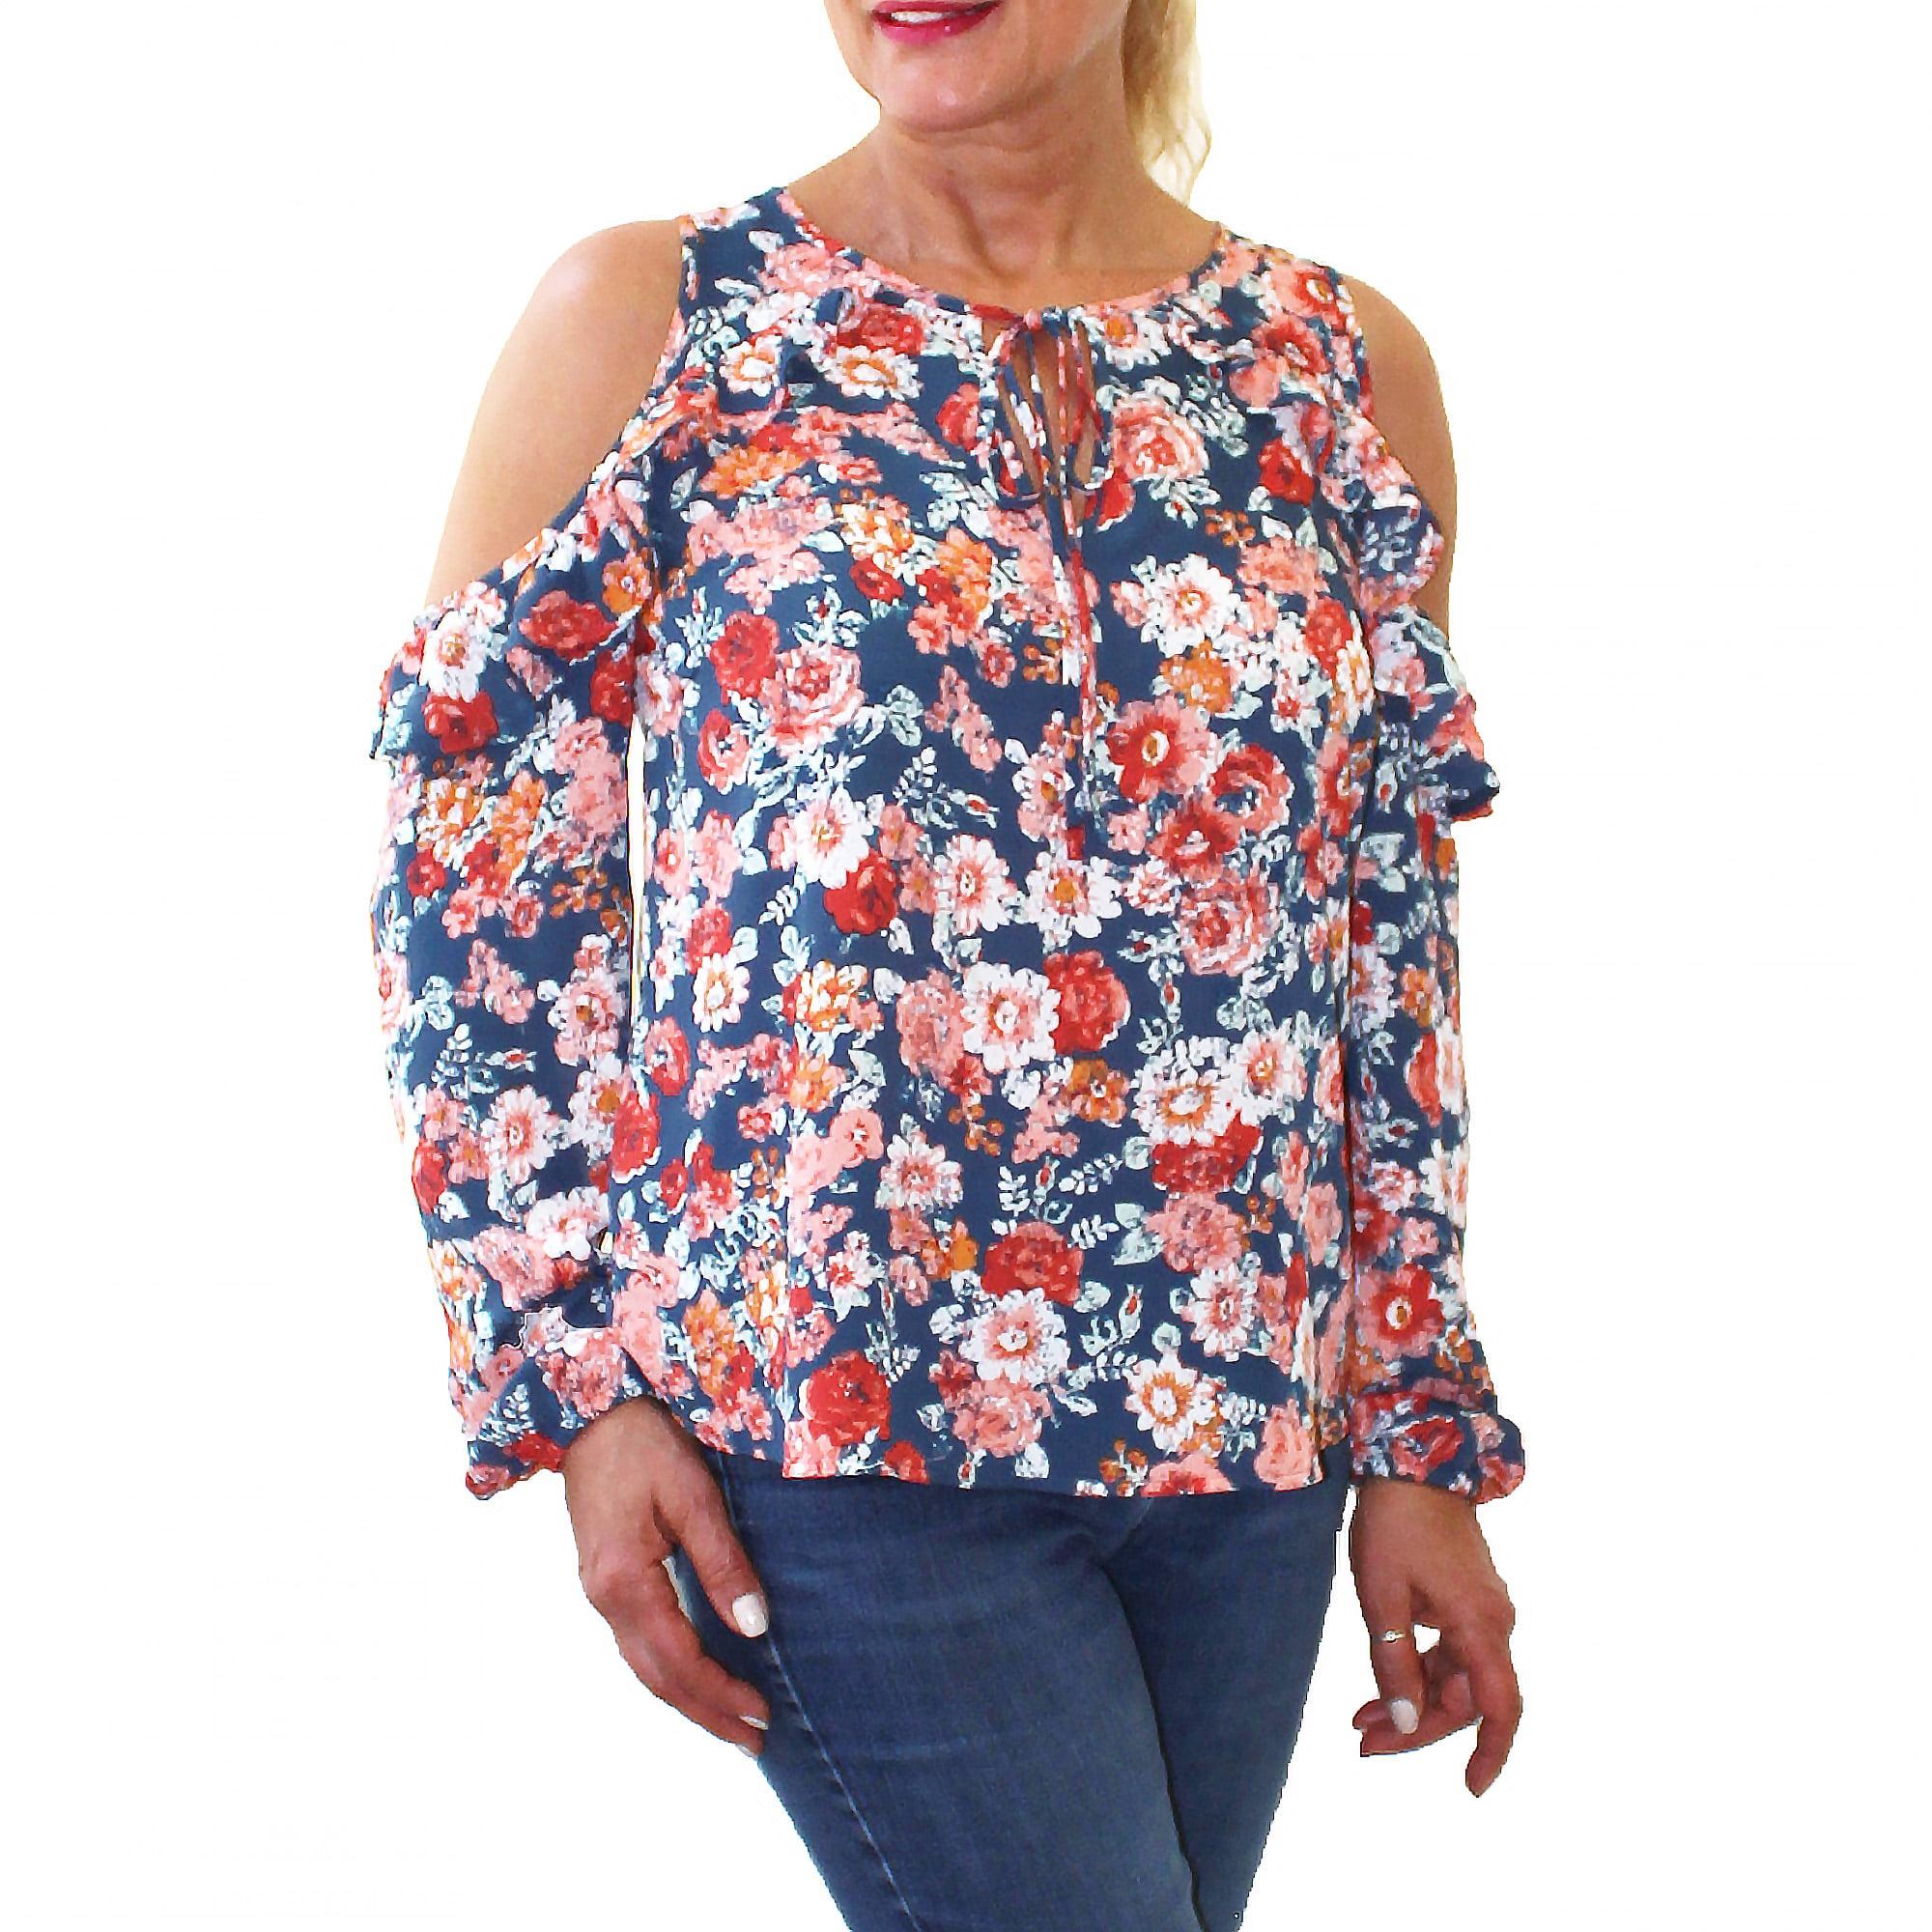 Women's Cold Shoulder Floral Top by Me Jane Ltd